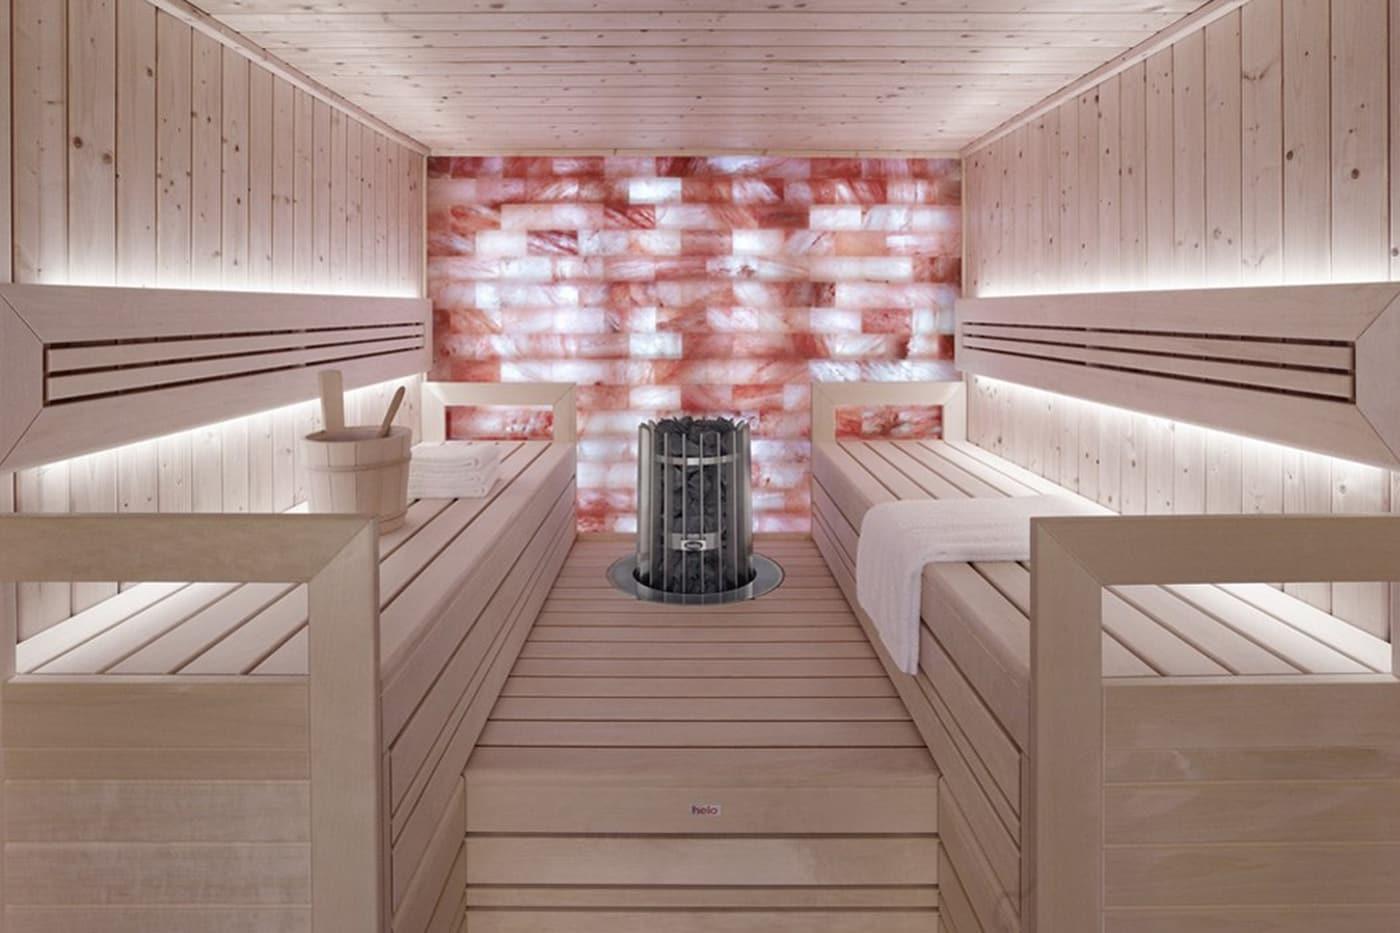 saunas-24-36-gal--200